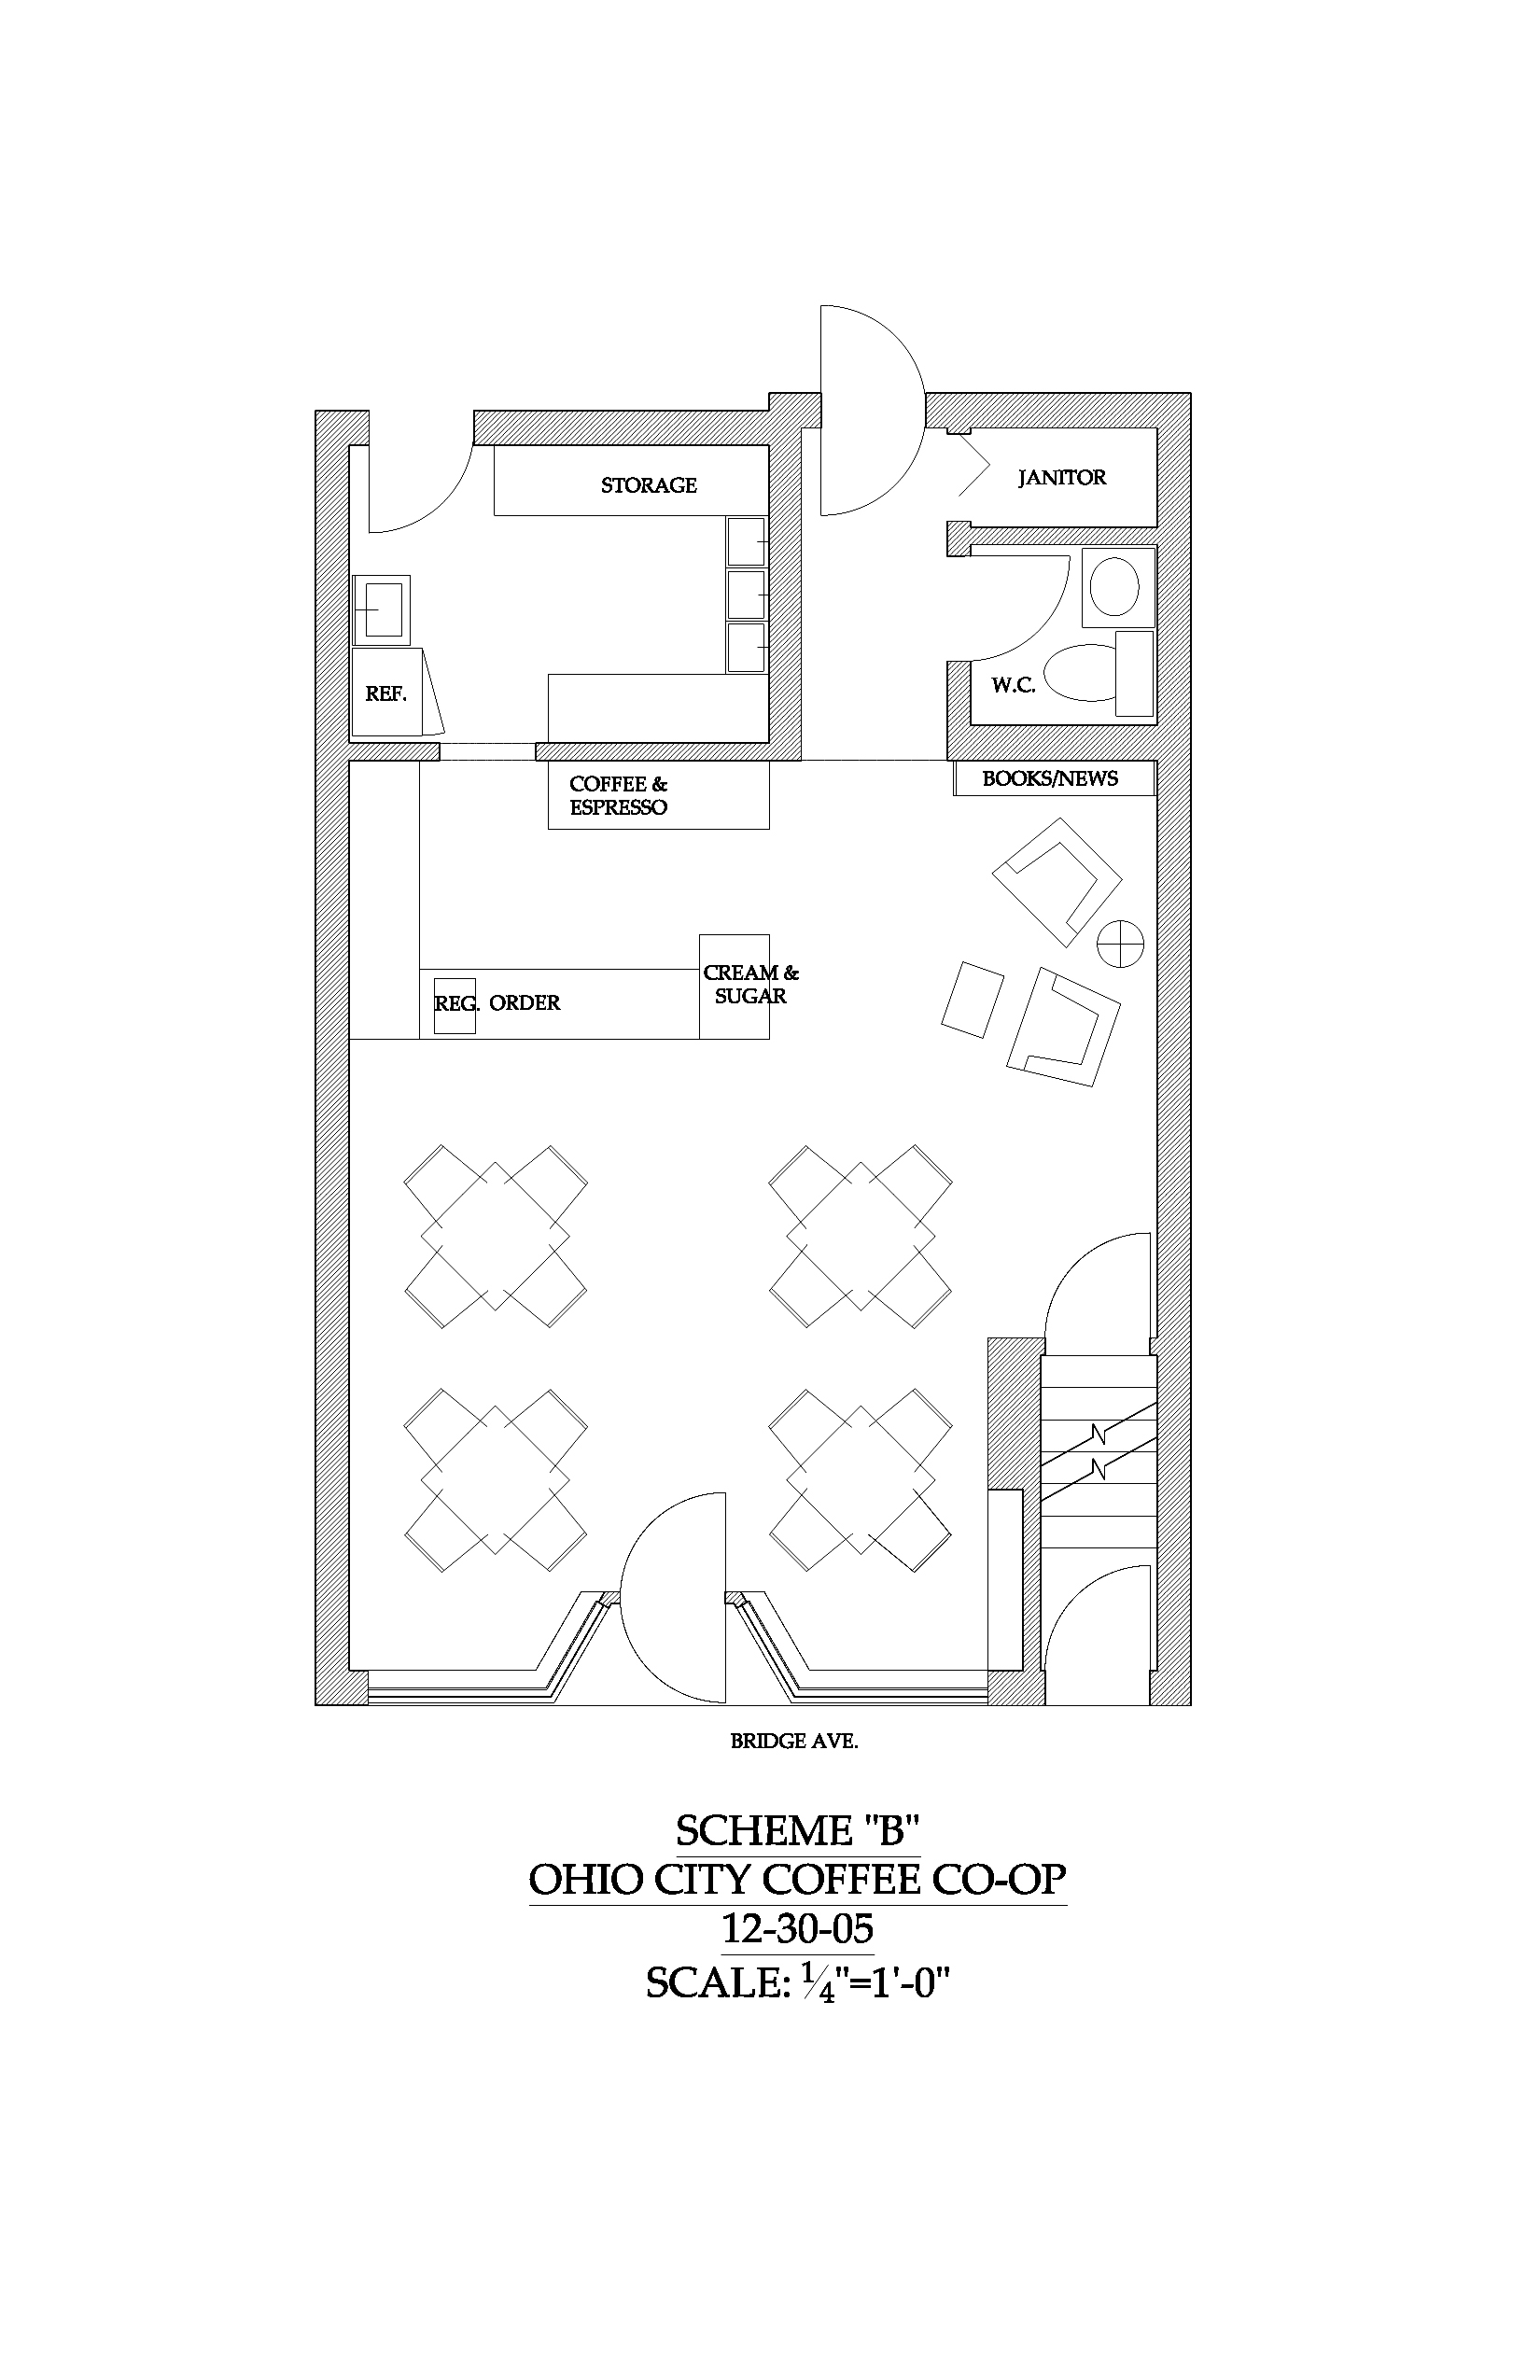 coffee shop business plan layout cheap essays online